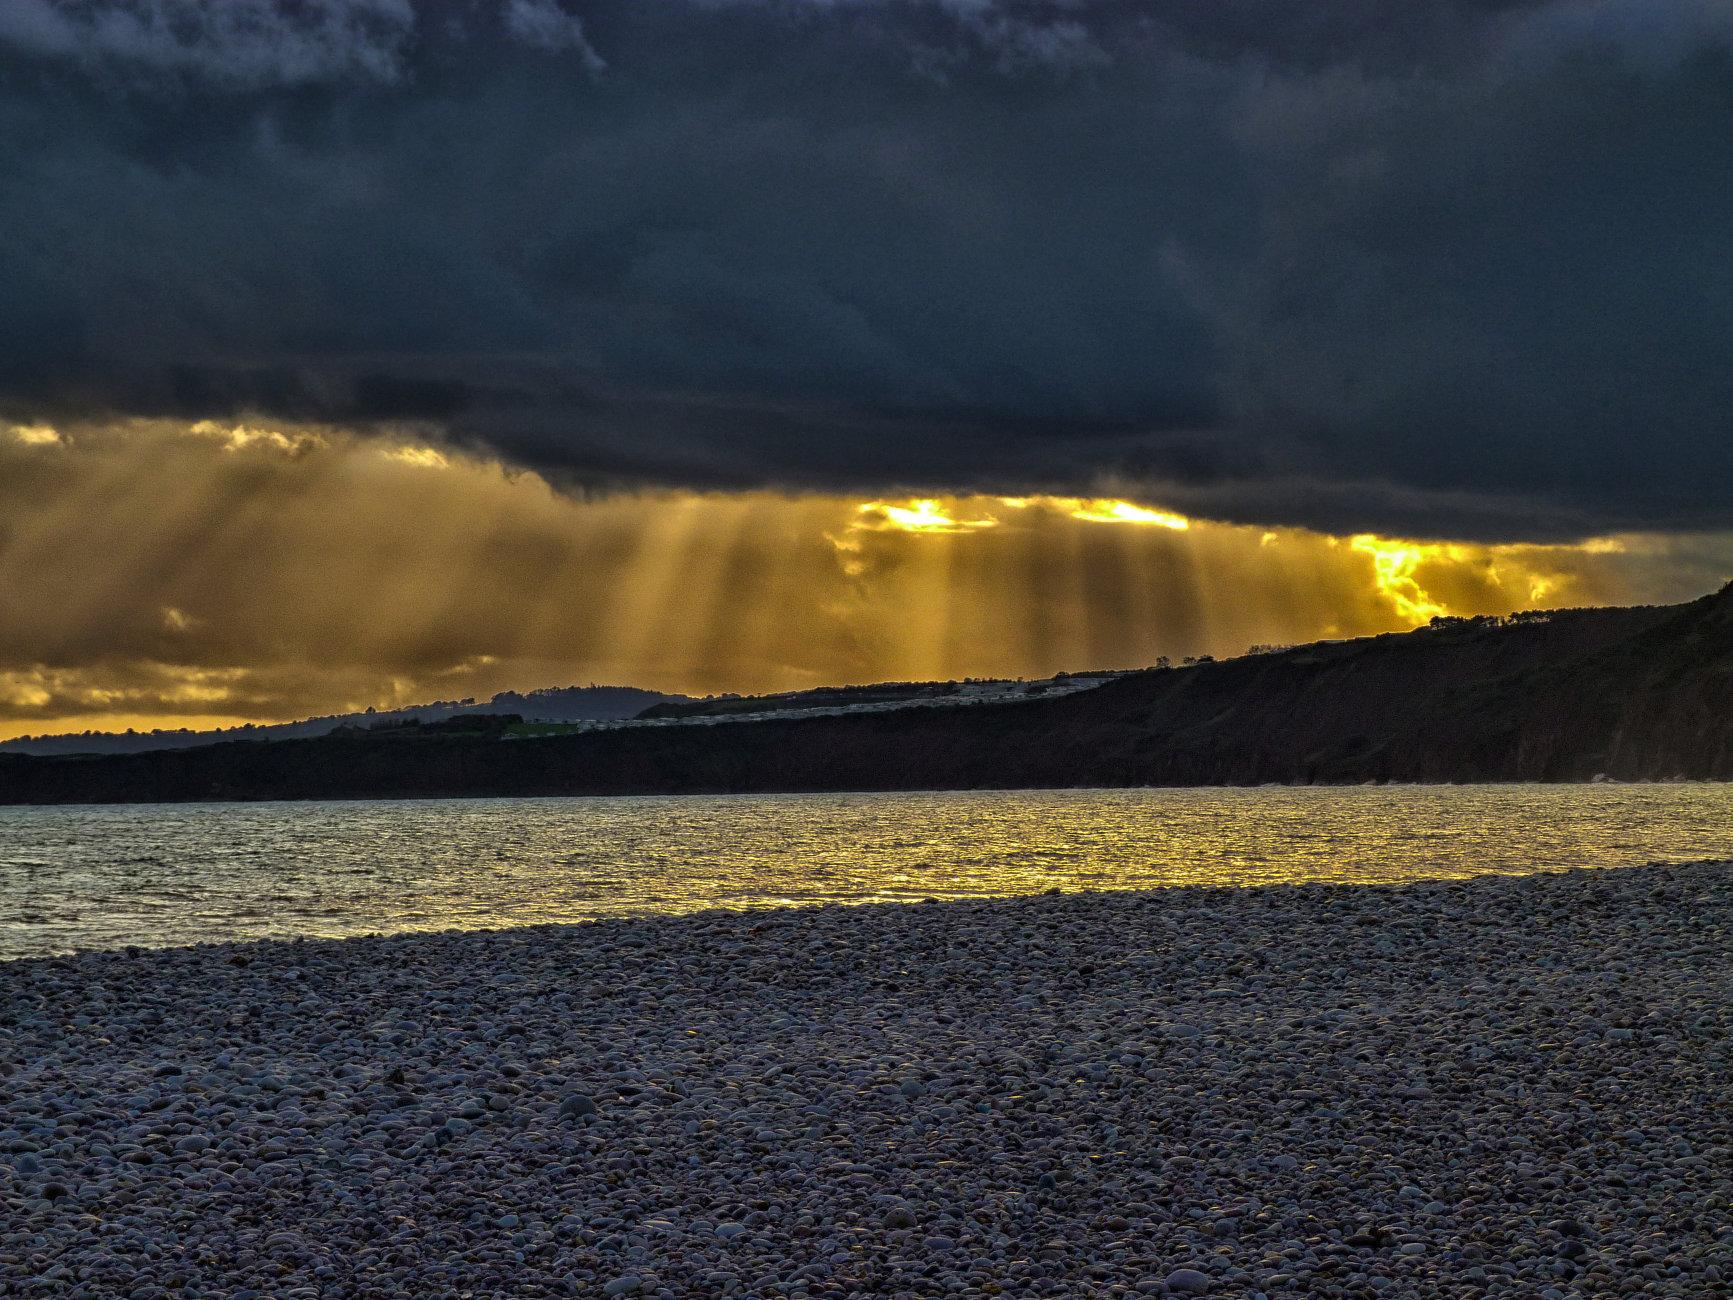 Sunbeams On The Sea - Budleigh Salterton, Devon